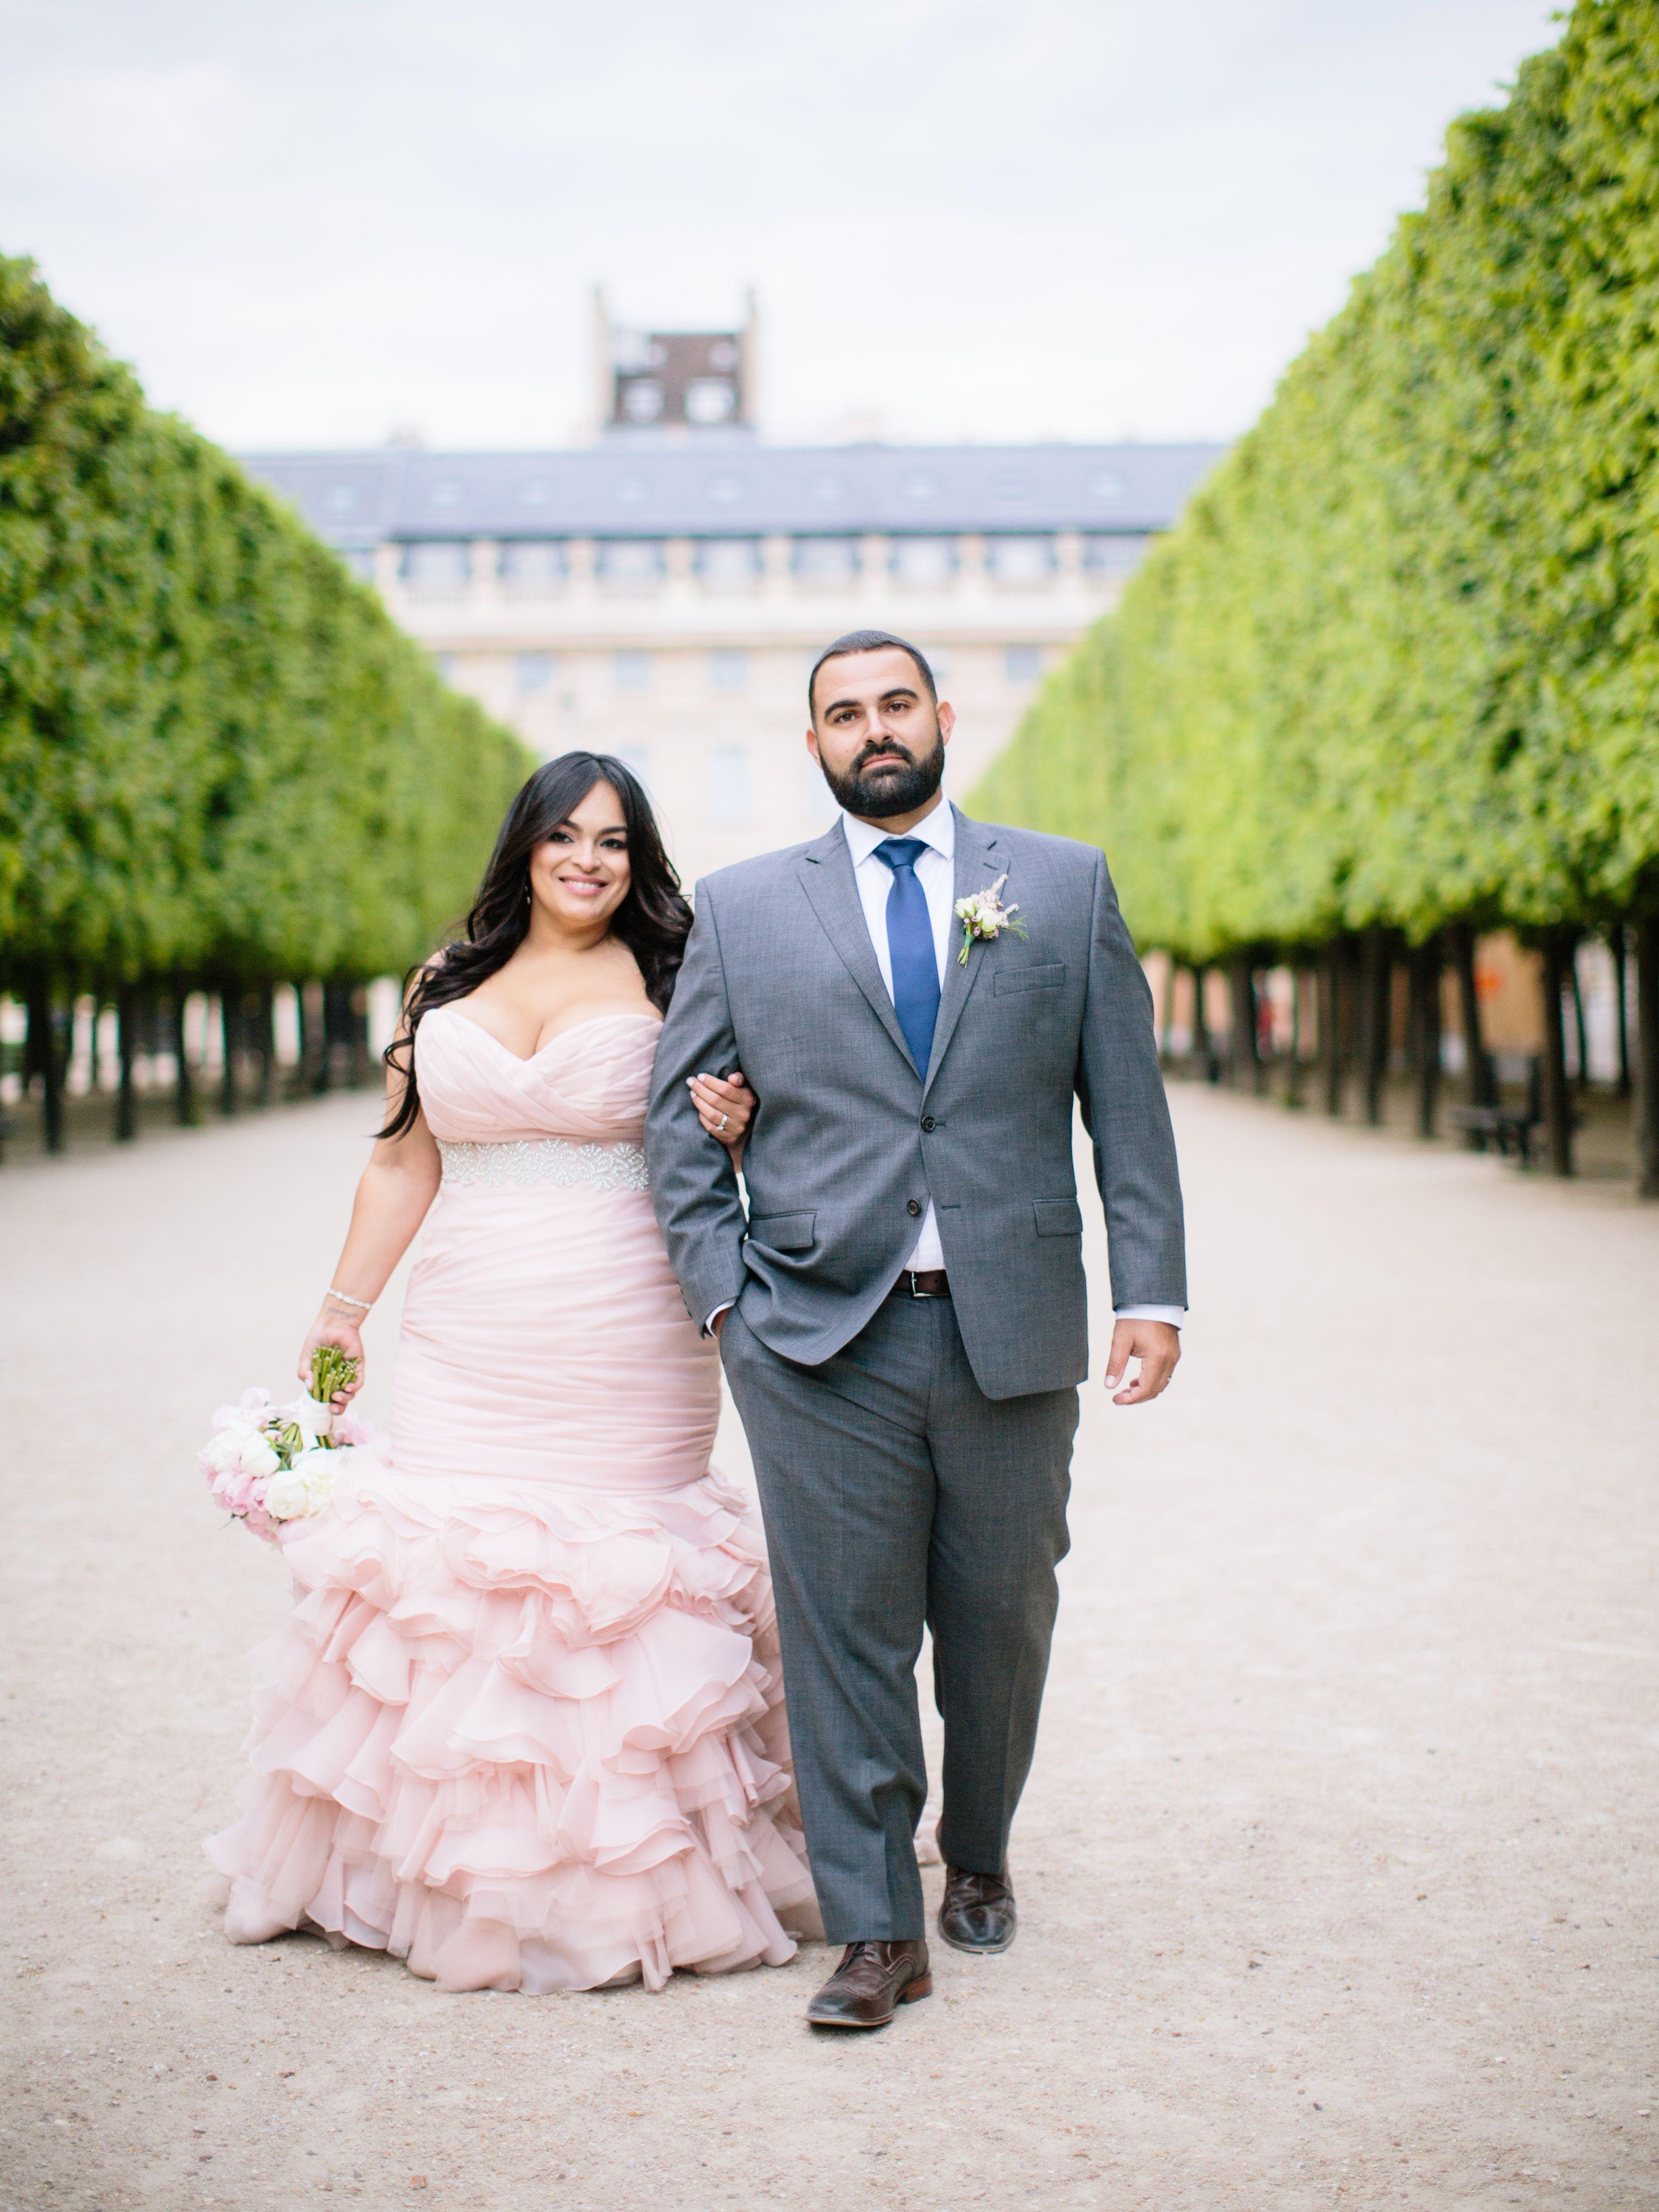 Plus size pink wedding dresses  Blush Divina Wedding Dress  Vestidos novia  Pinterest  Wedding